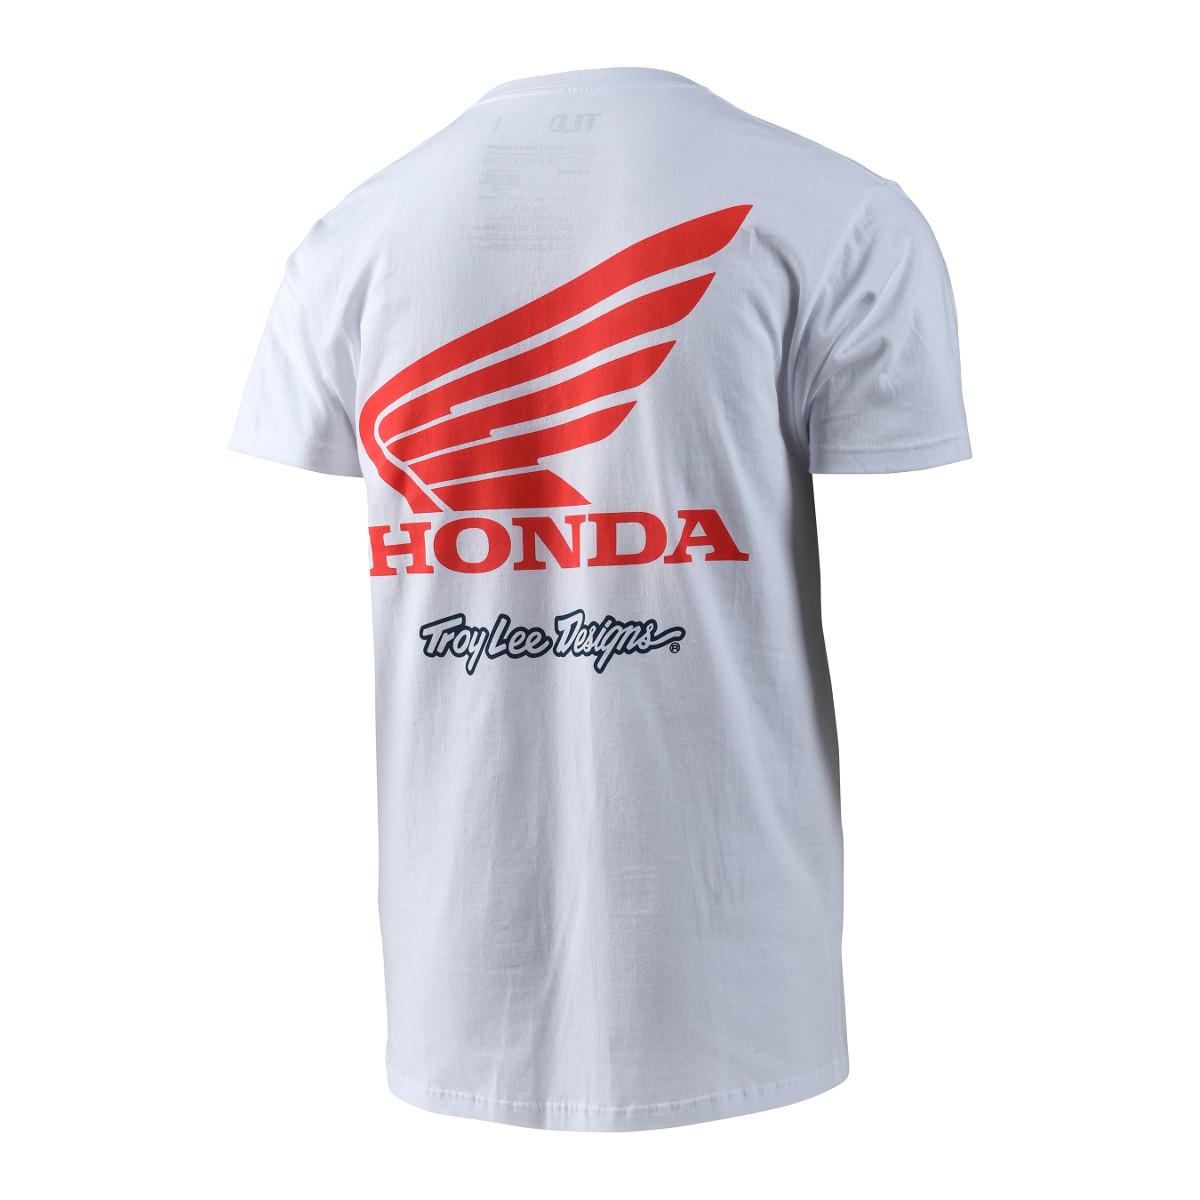 T-shirt Troy Lee Designs Honda casual da adulto